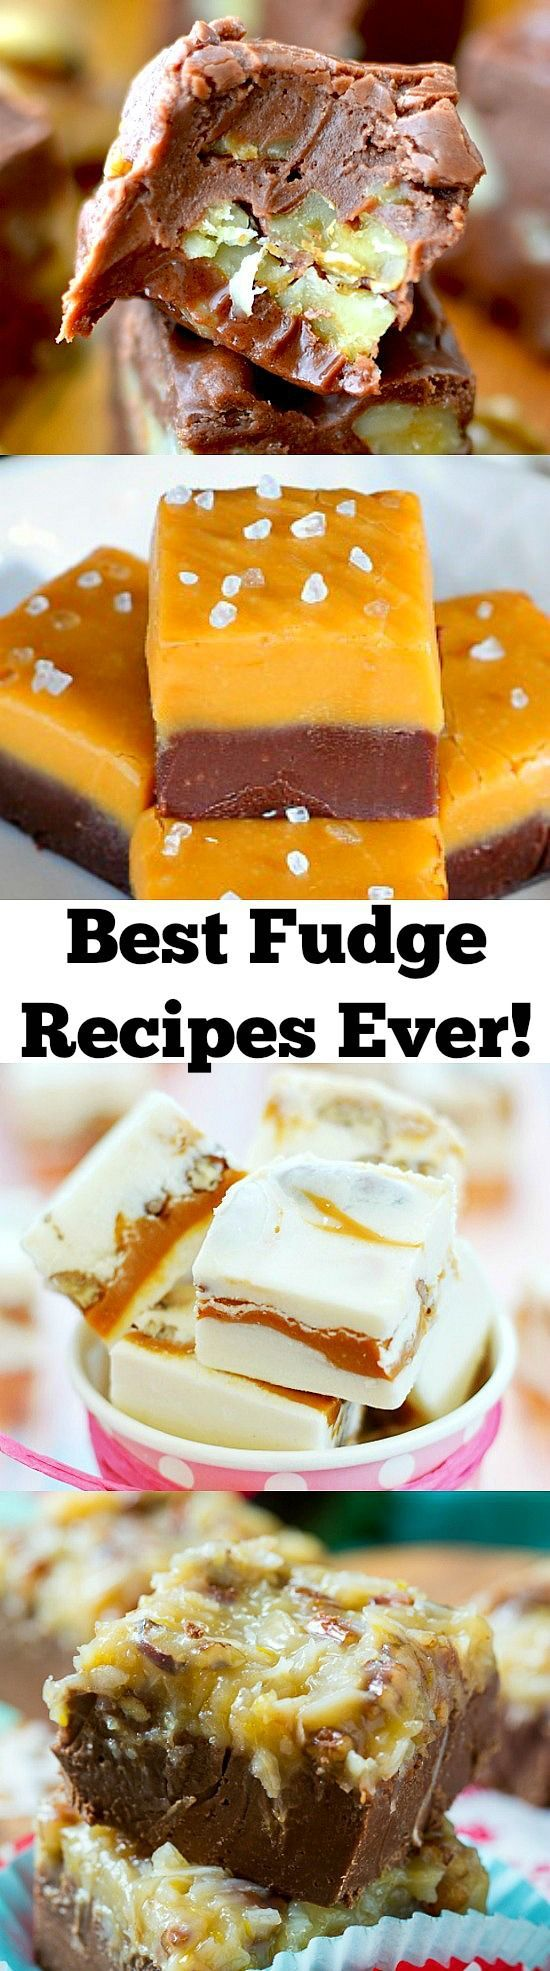 25 of the BEST Fudge Recipes EVER!